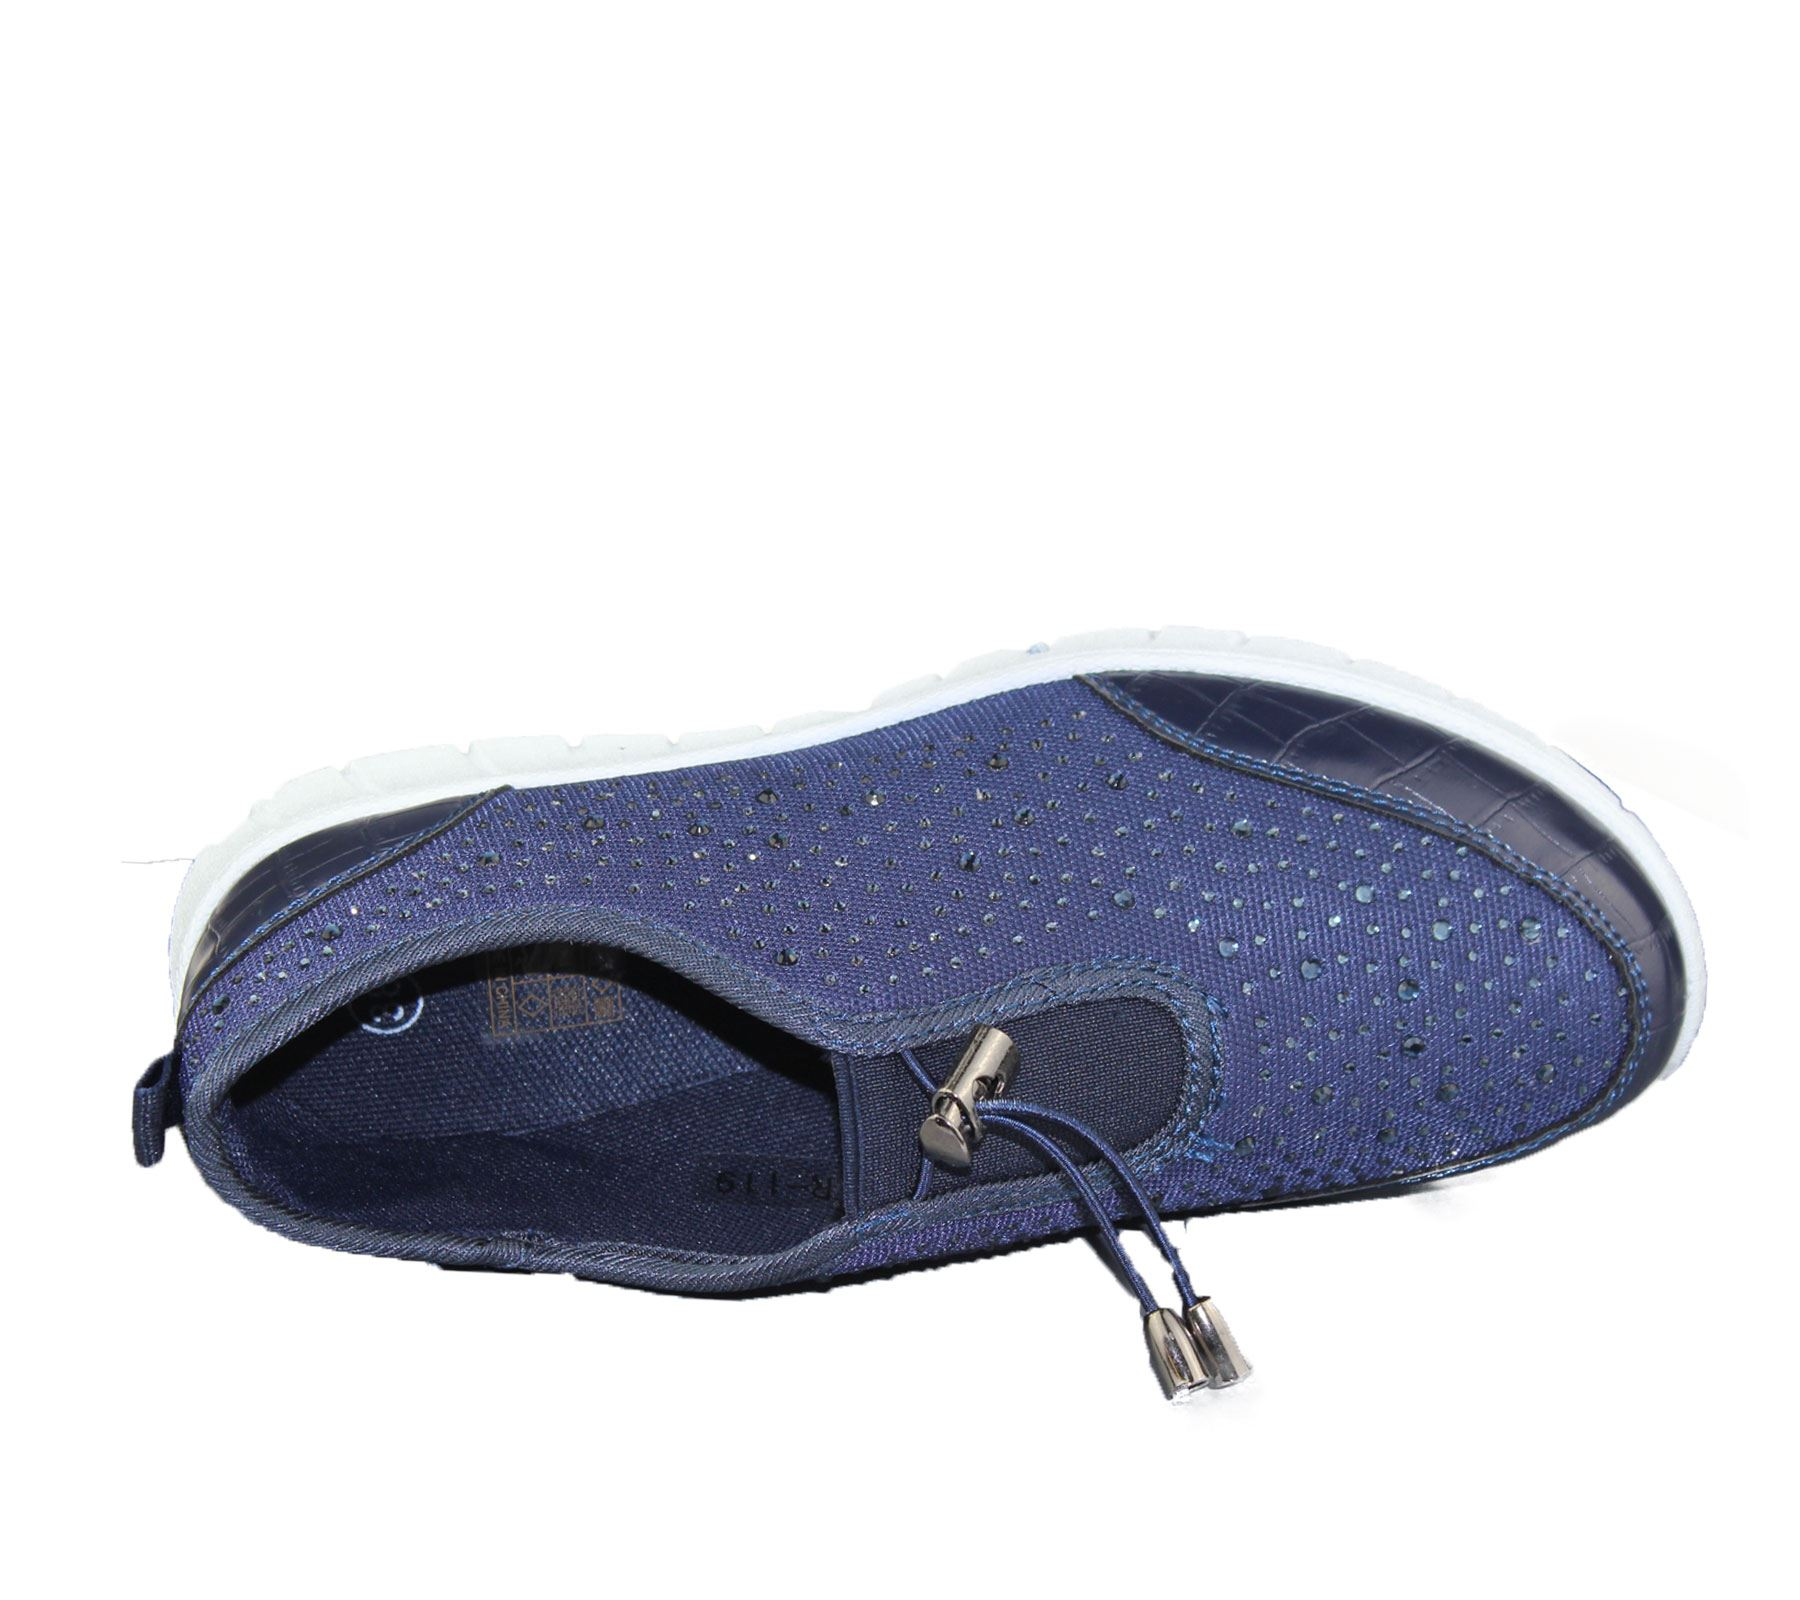 Womens-Trainer-Ladies-Comfort-Walking-Fashion-Summer-Gym-Sport-Flat-Shoes-Size thumbnail 16